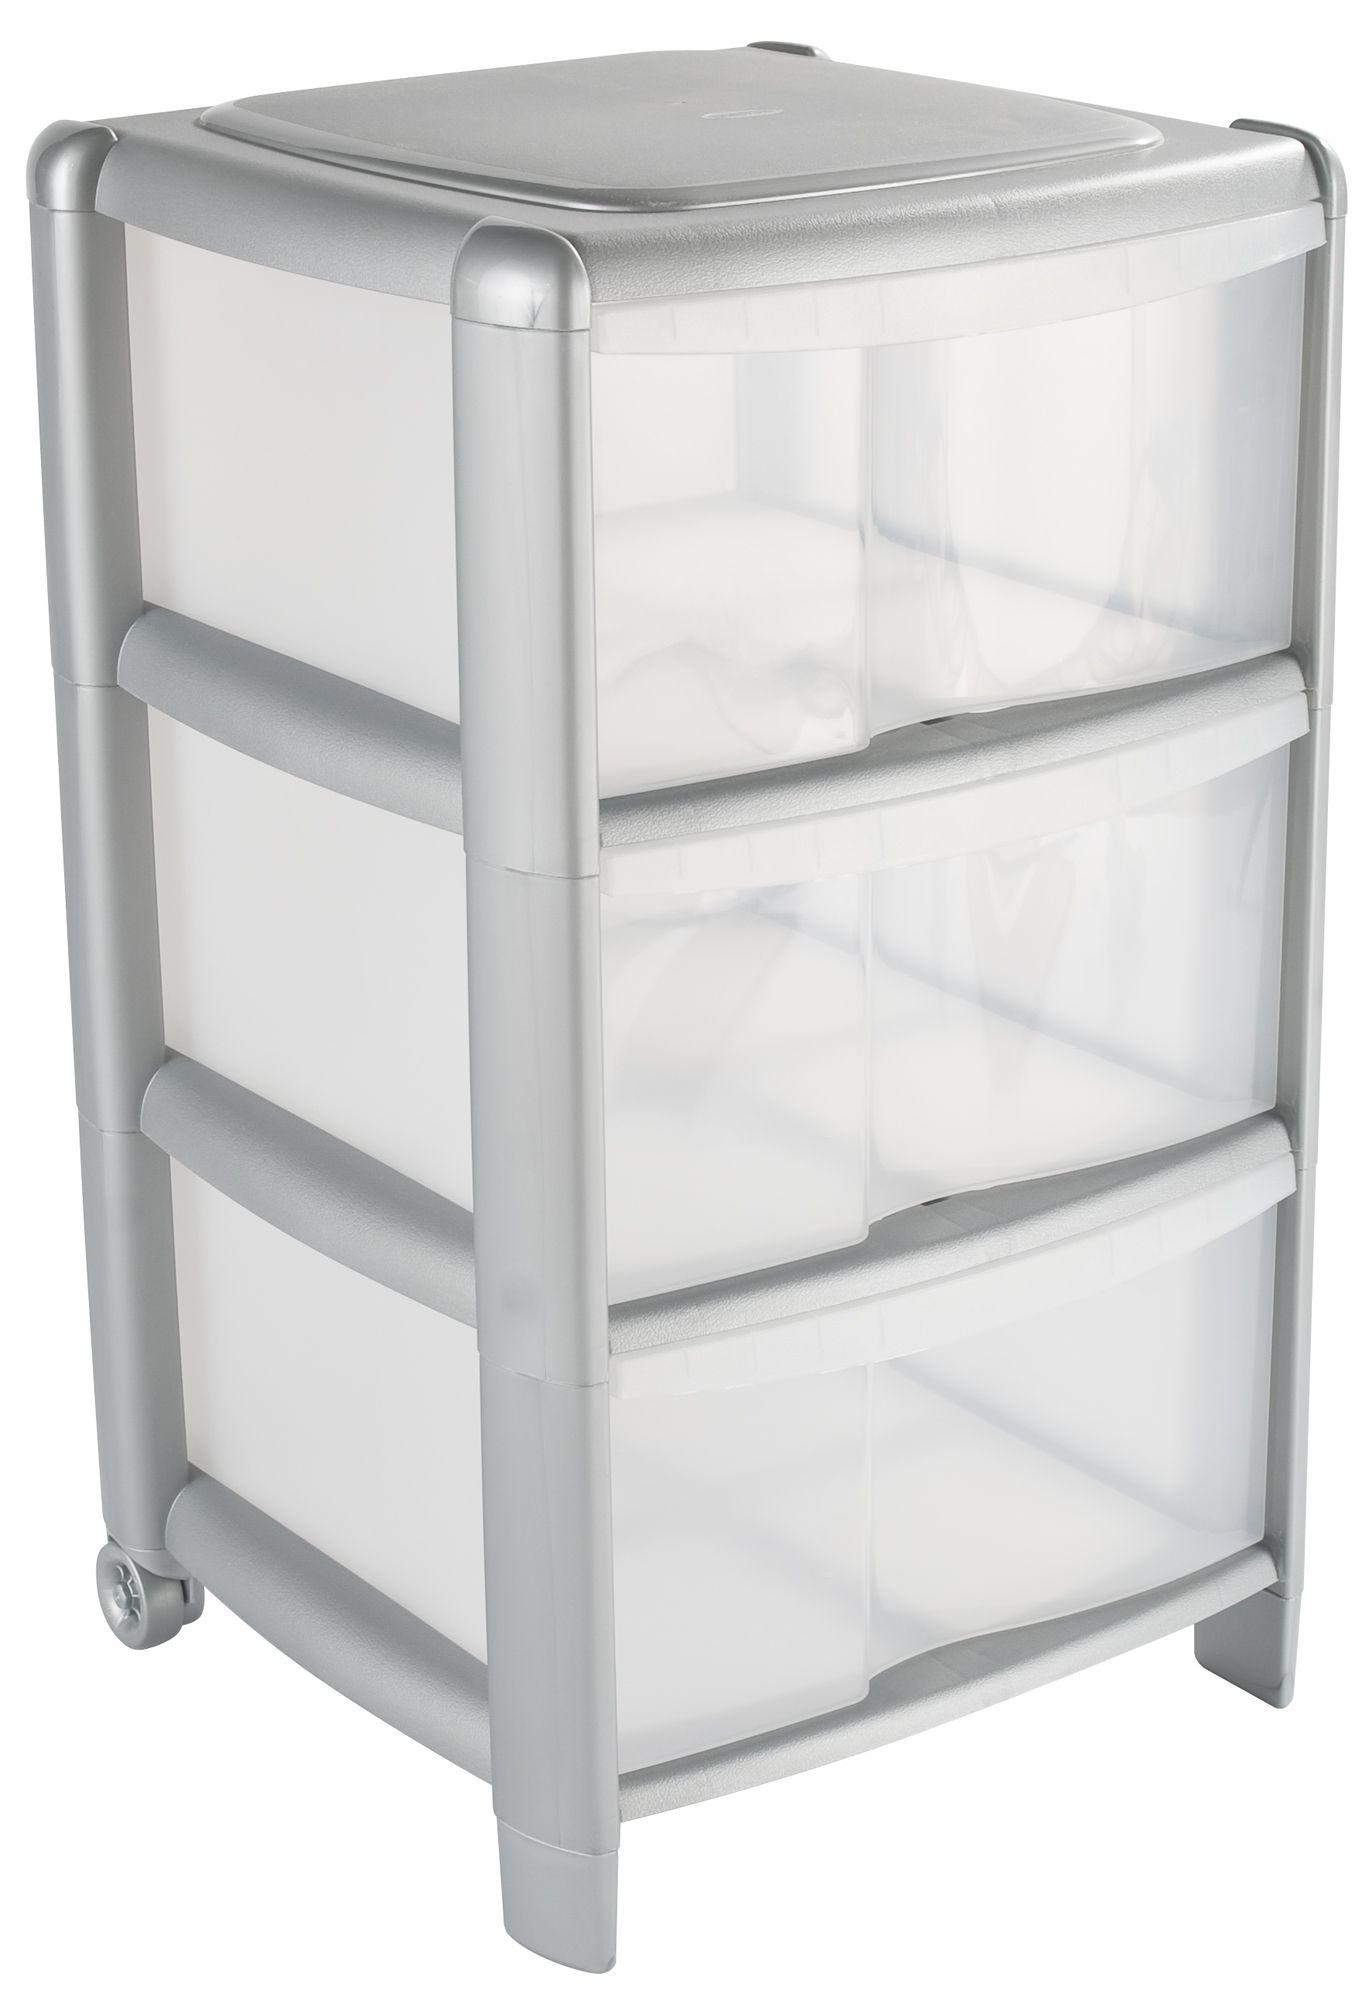 B&q Clear Plastic Drawer Tower Unit